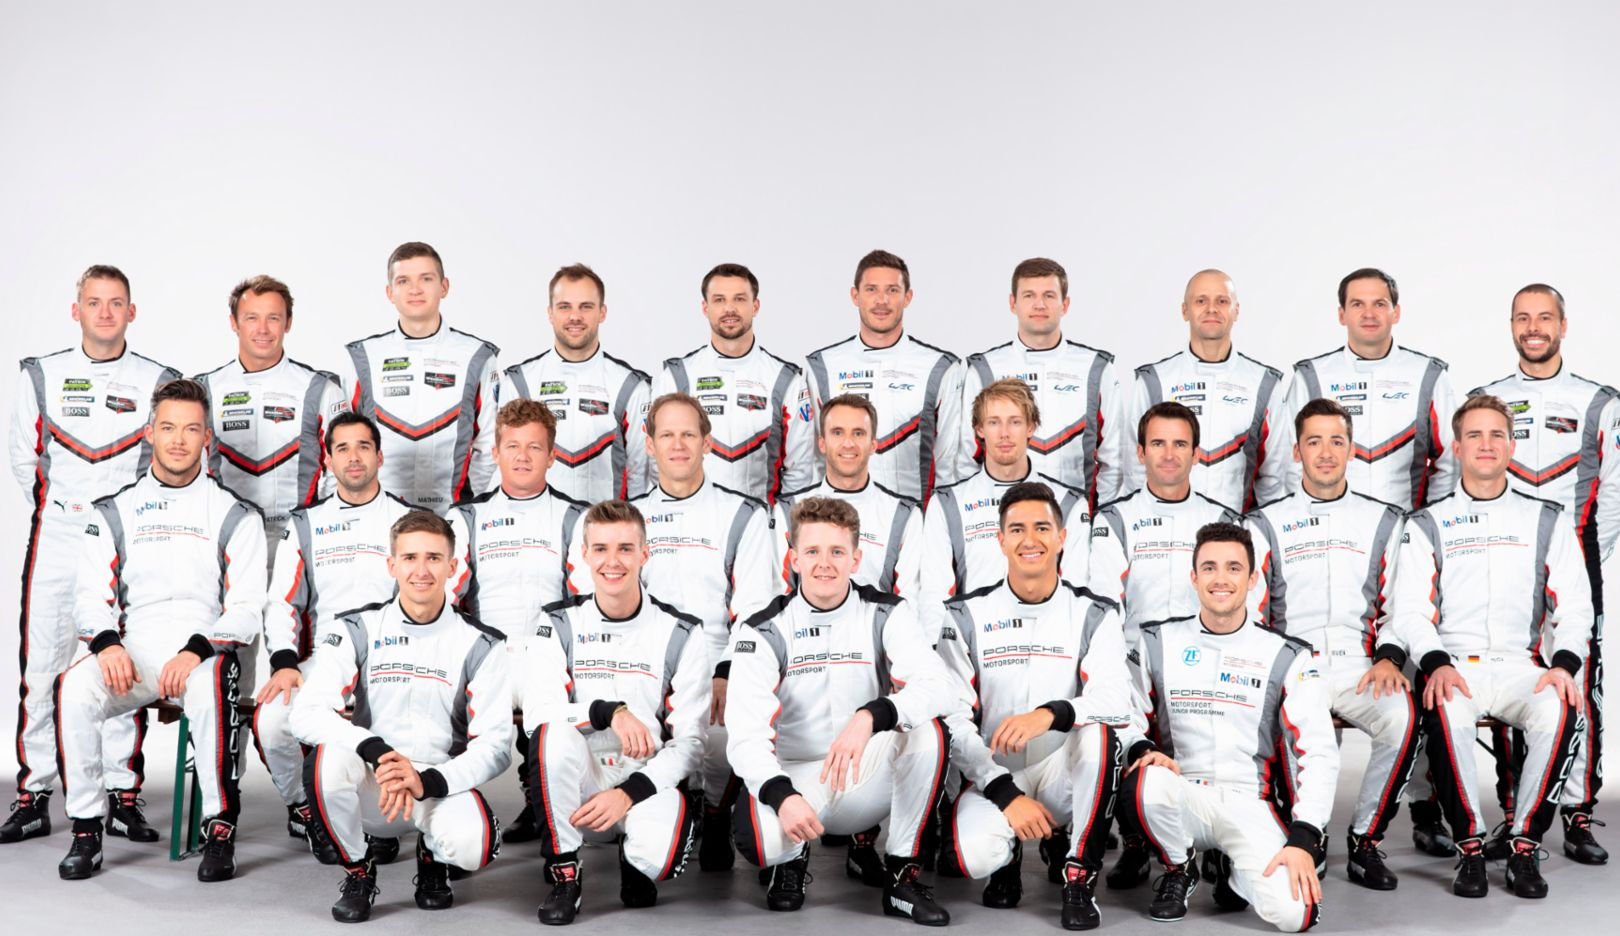 Porsche Works Drivers 2019, 2019, Porsche AG